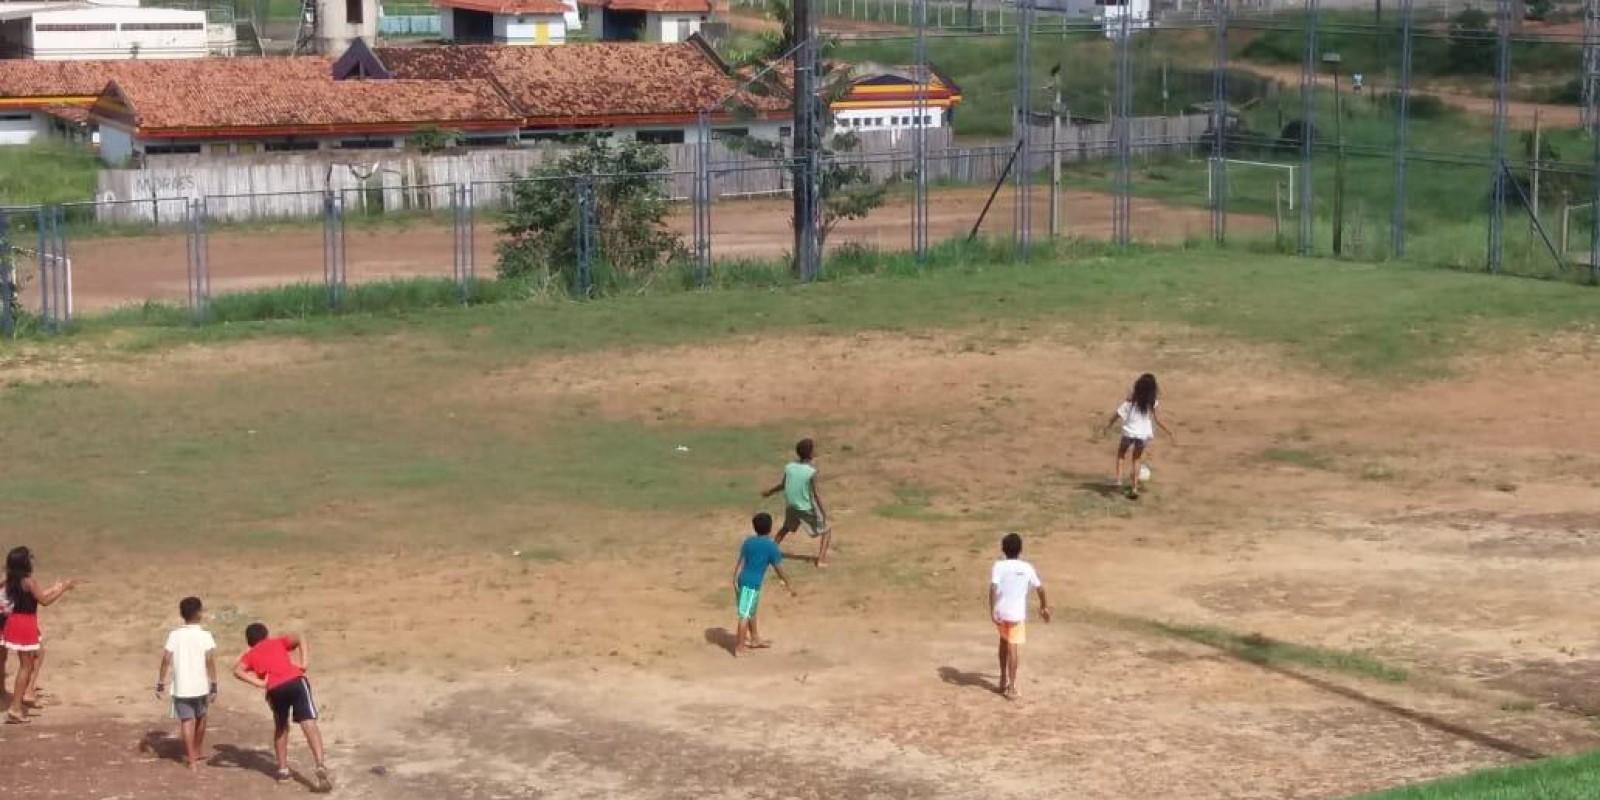 Dia do Desafio 2018 - município de Laranjal do Jari